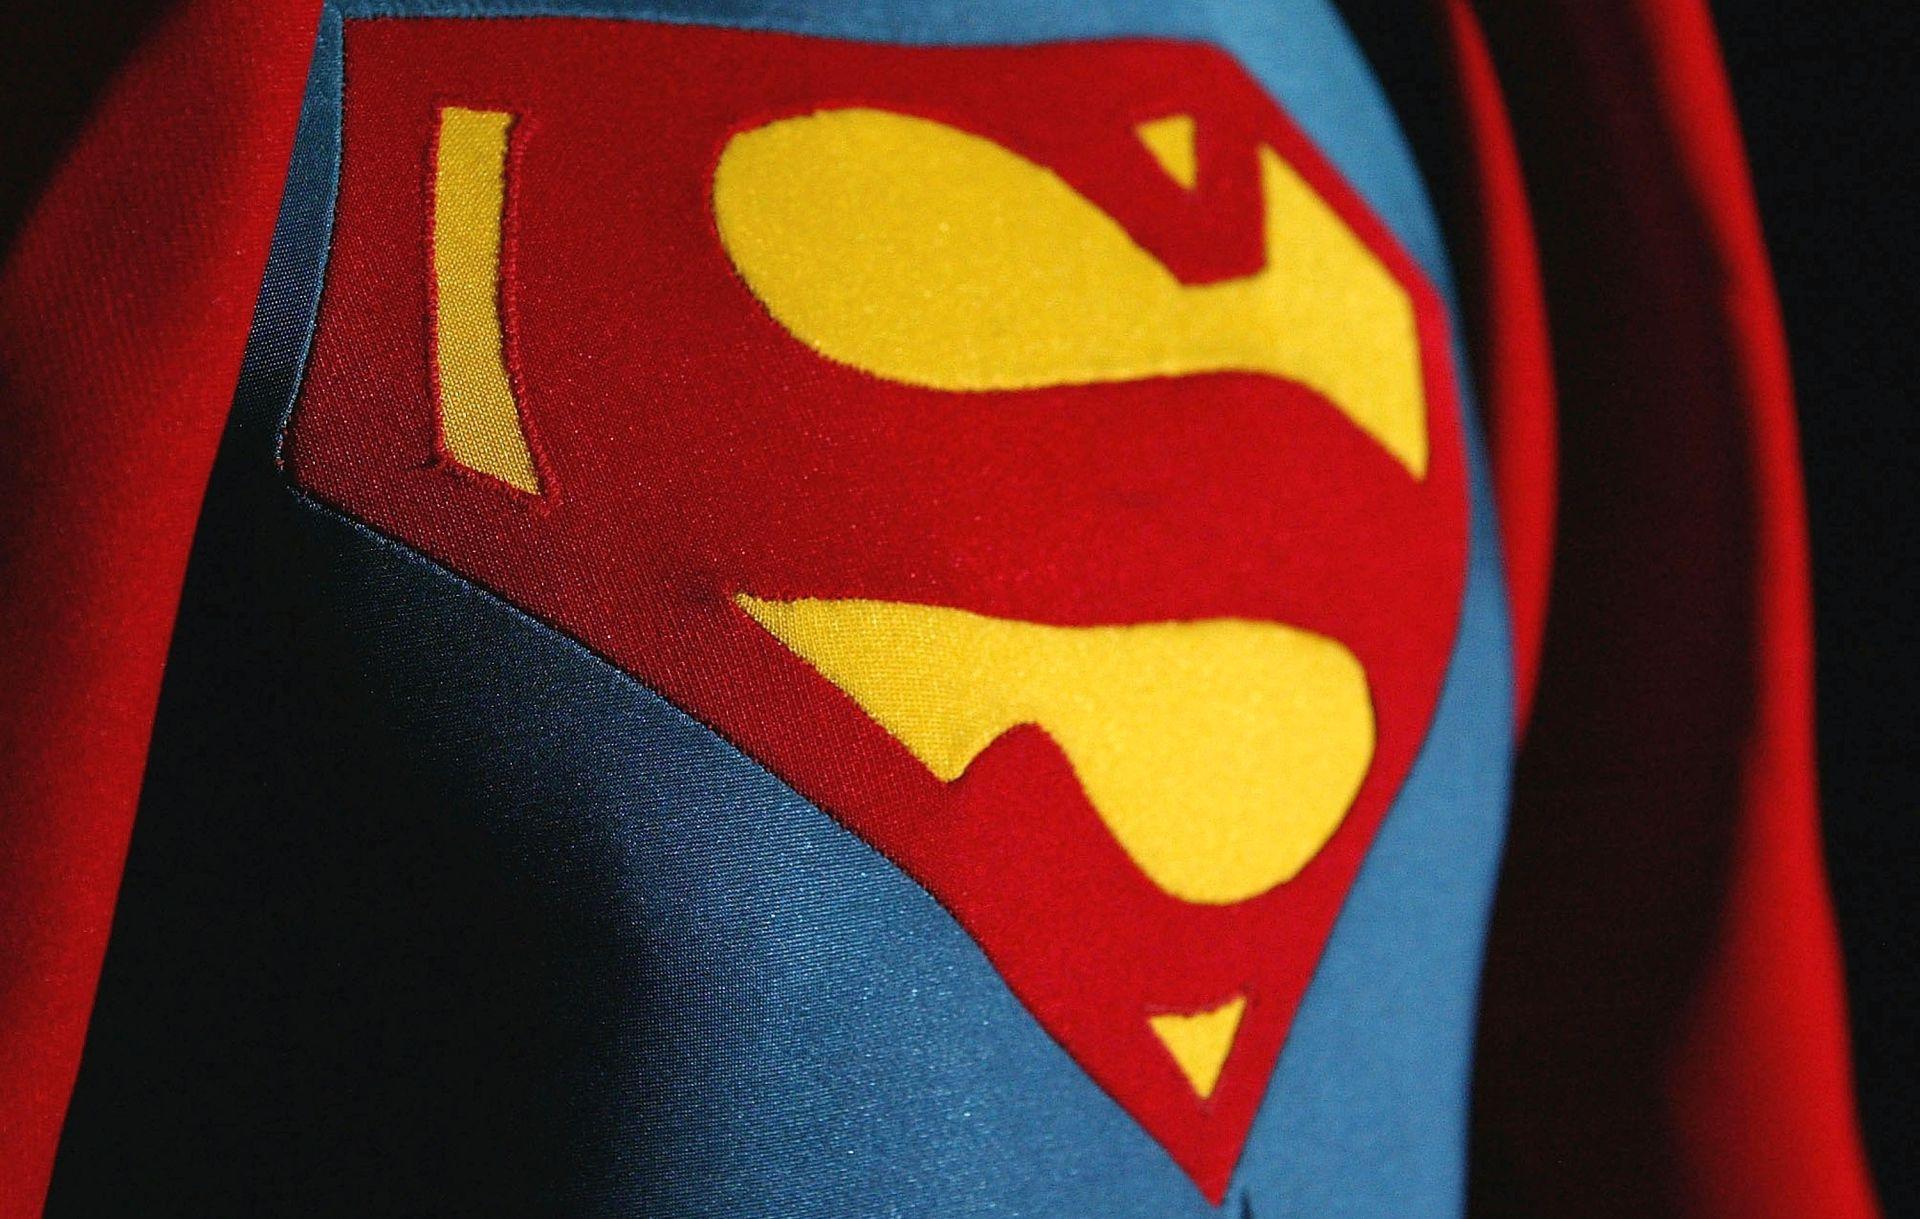 AUKCIJA U TEXASU Prvi broj stripa Superman prodan za skoro milijun dolara